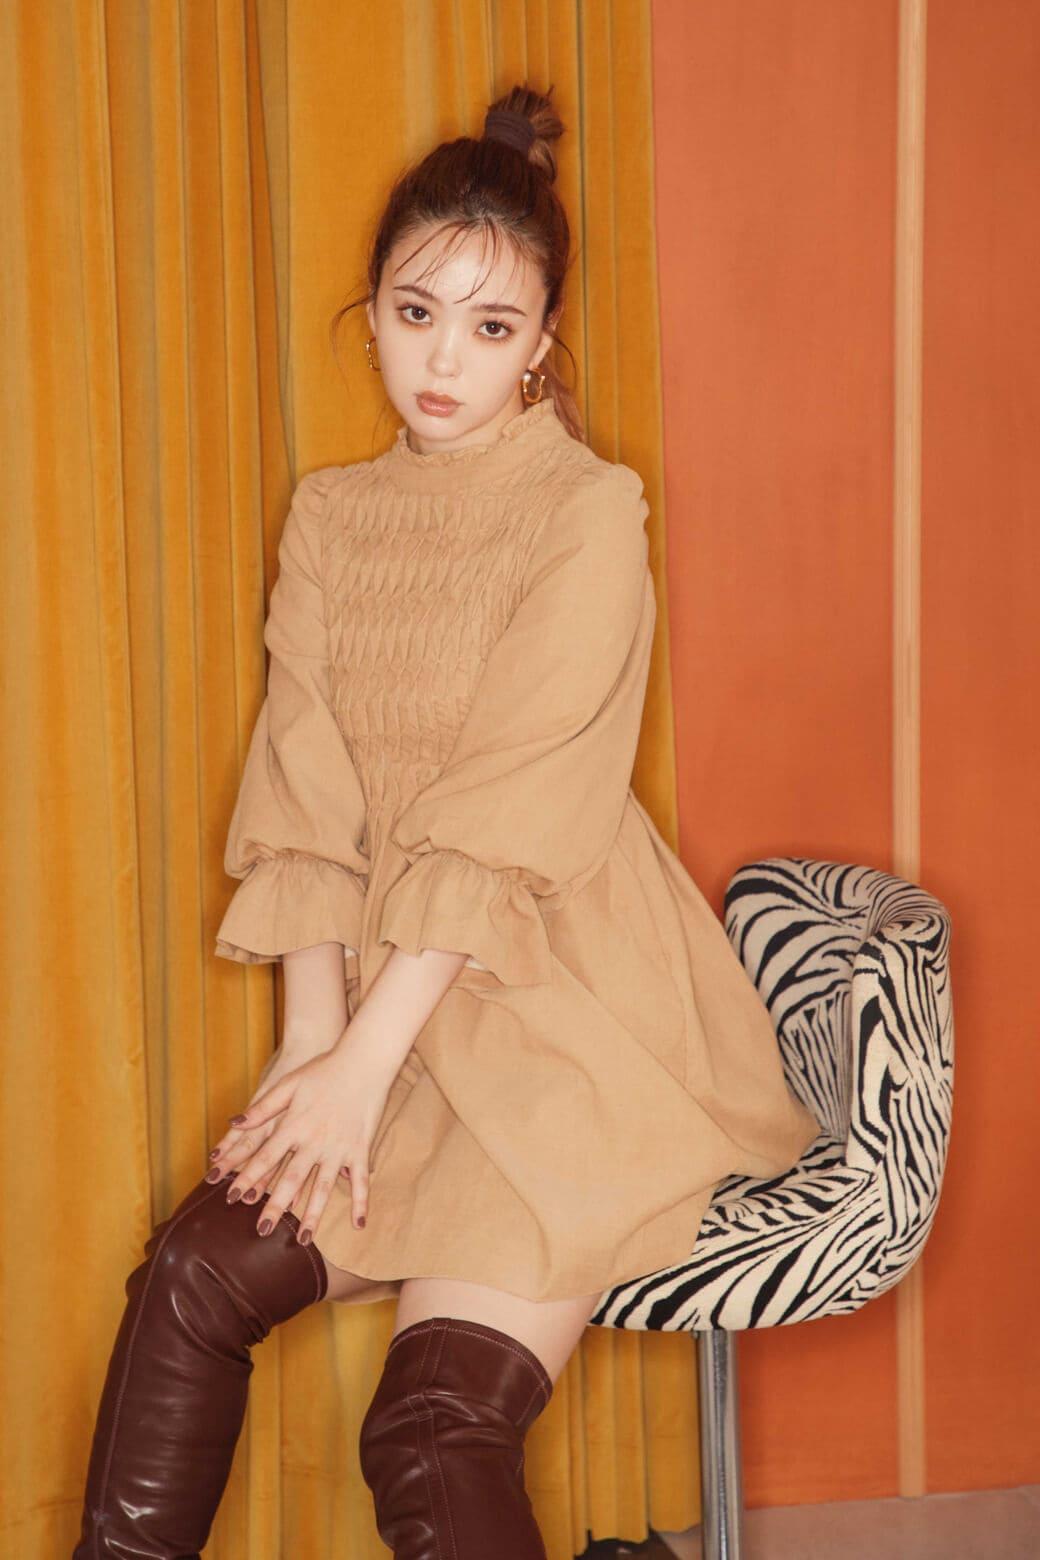 021 Autumn webmagazine